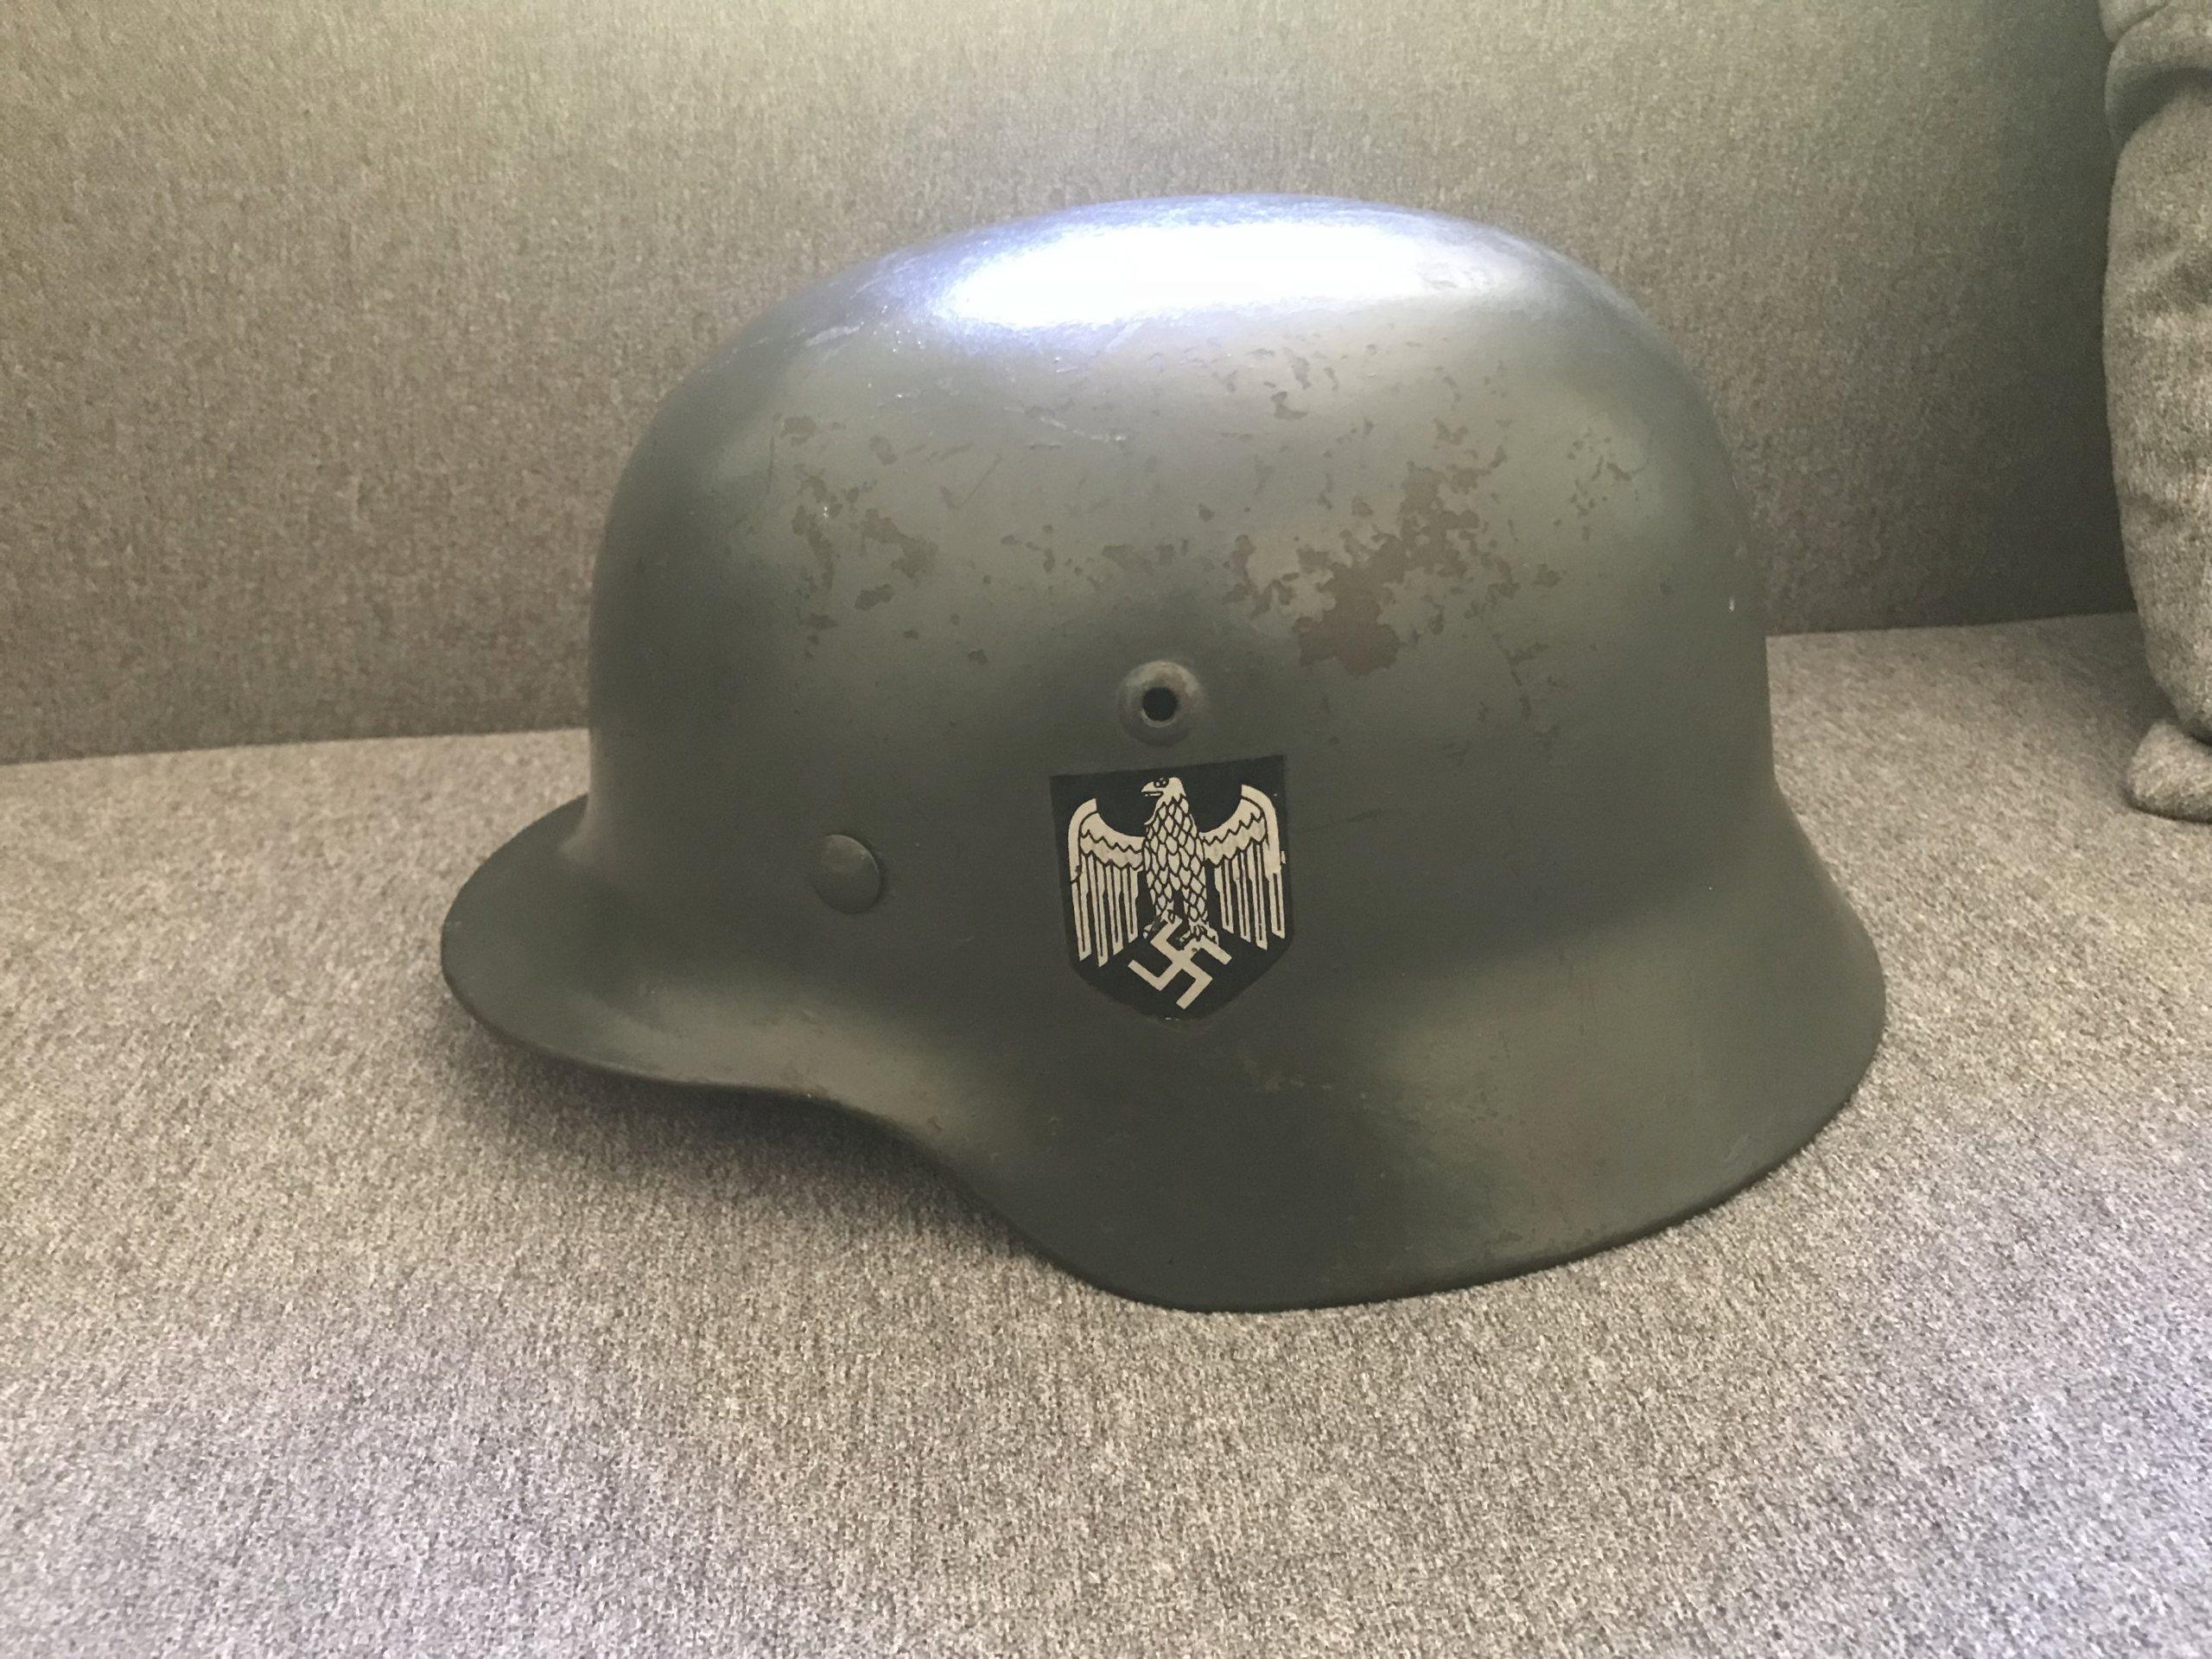 casque allemand ww2 Img_4146